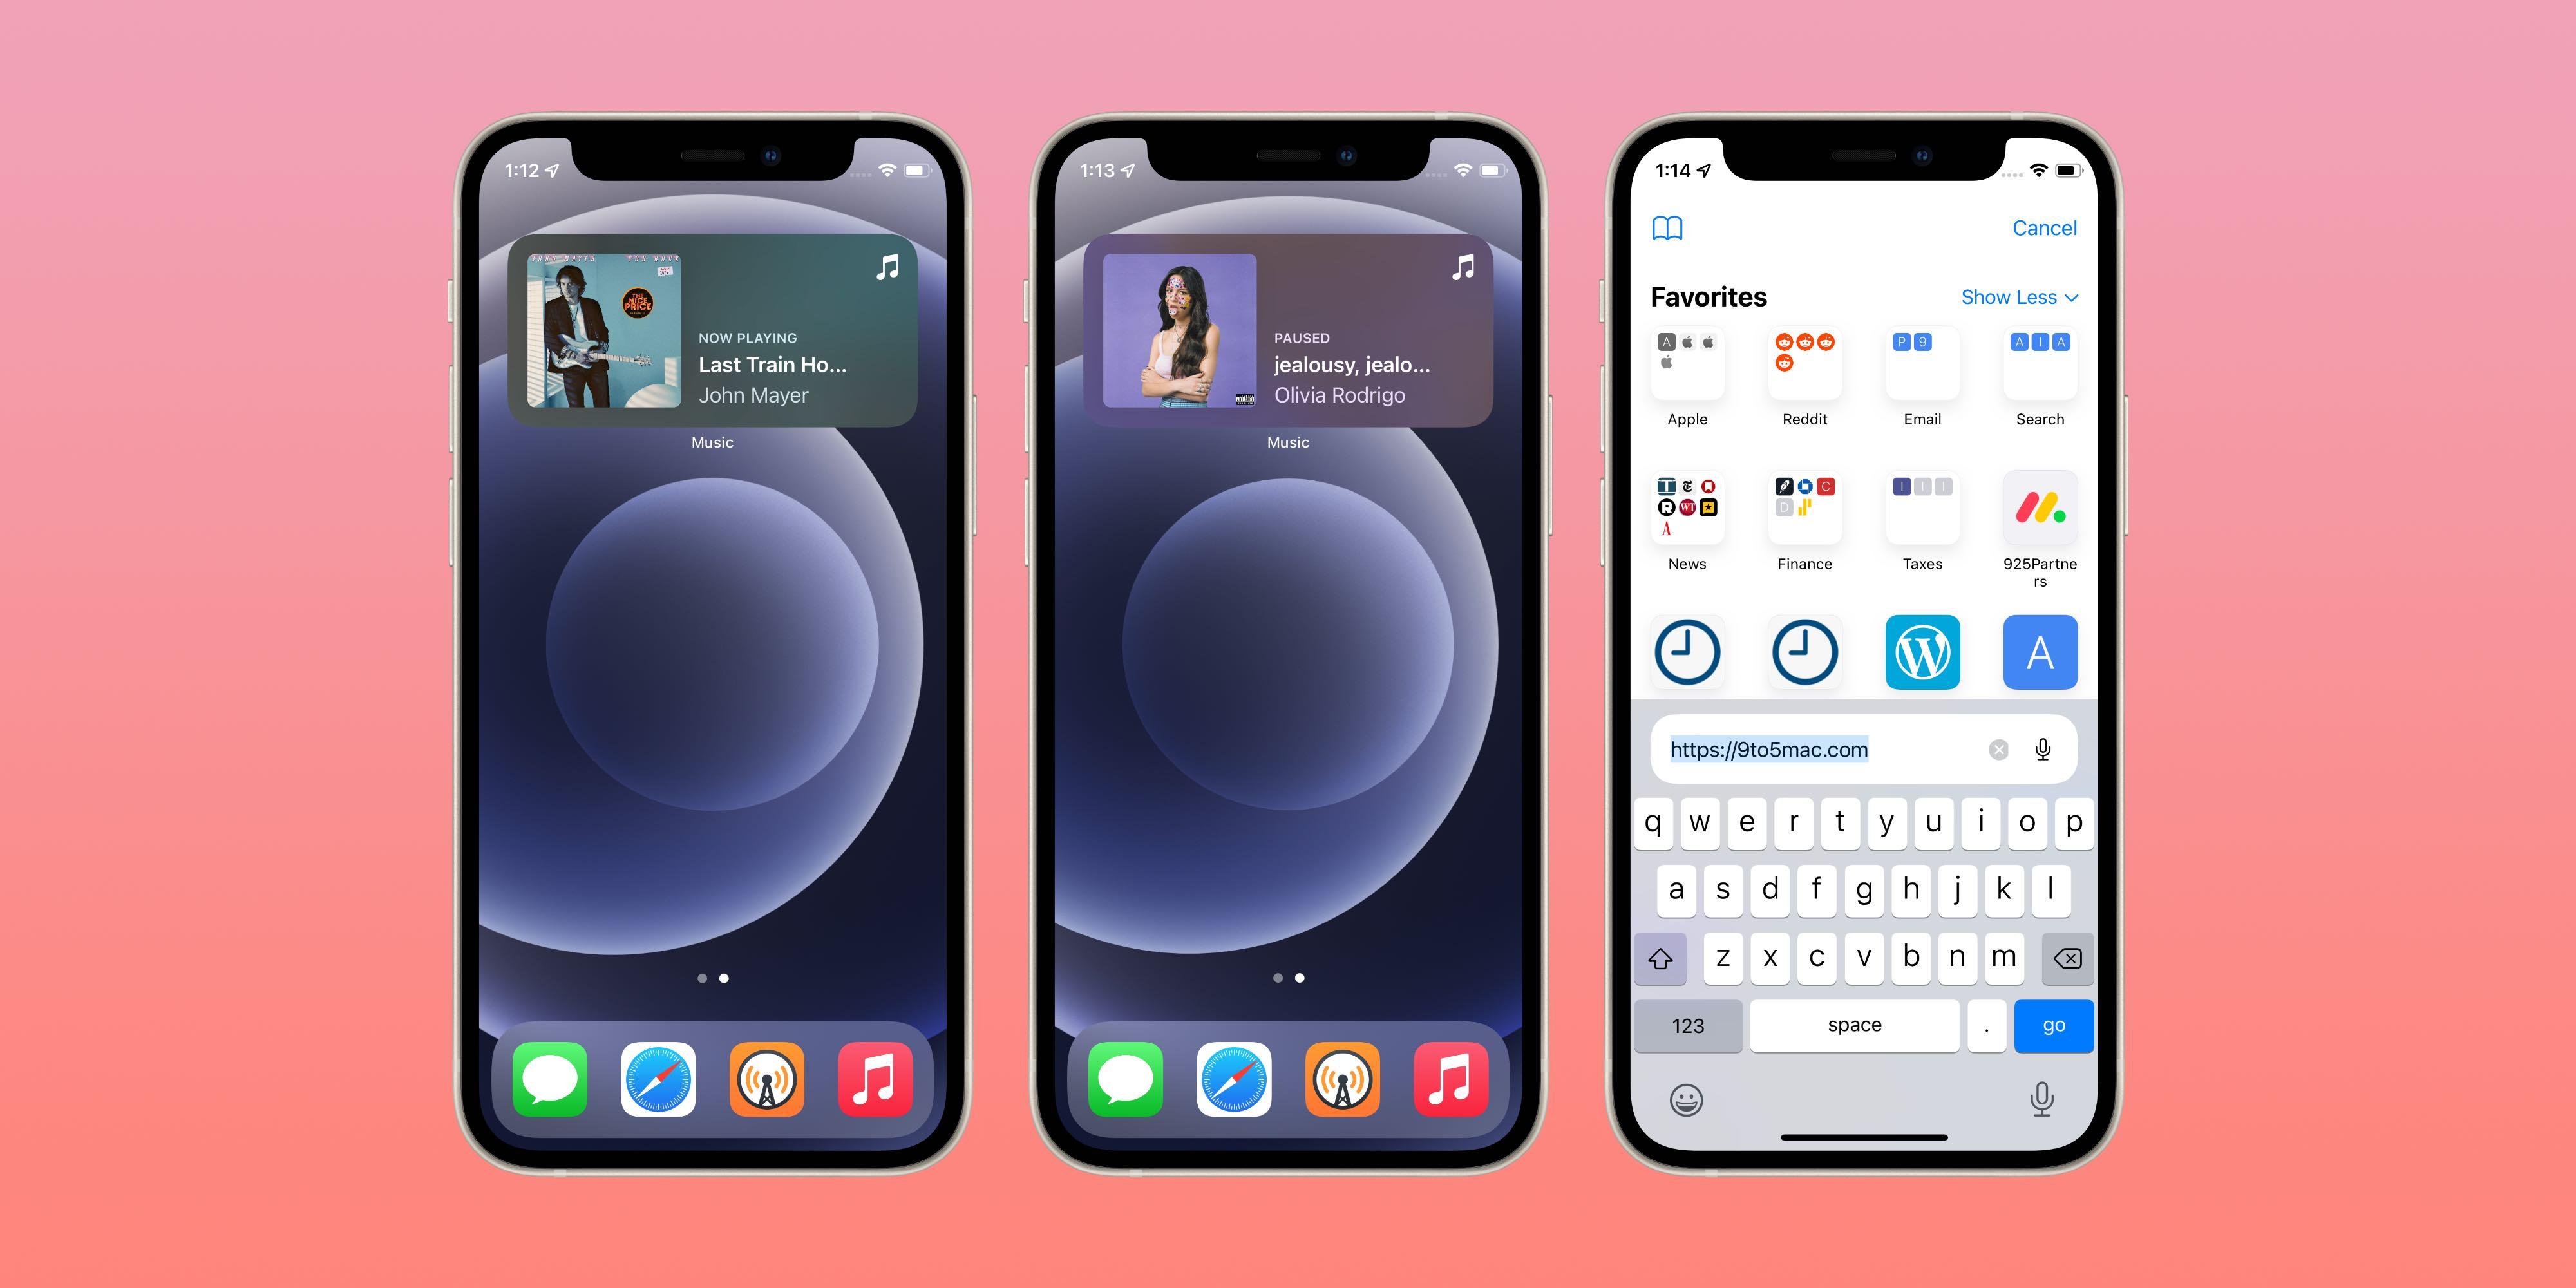 What's new in iOS 15 beta 3? Safari changes, Music widgets ...